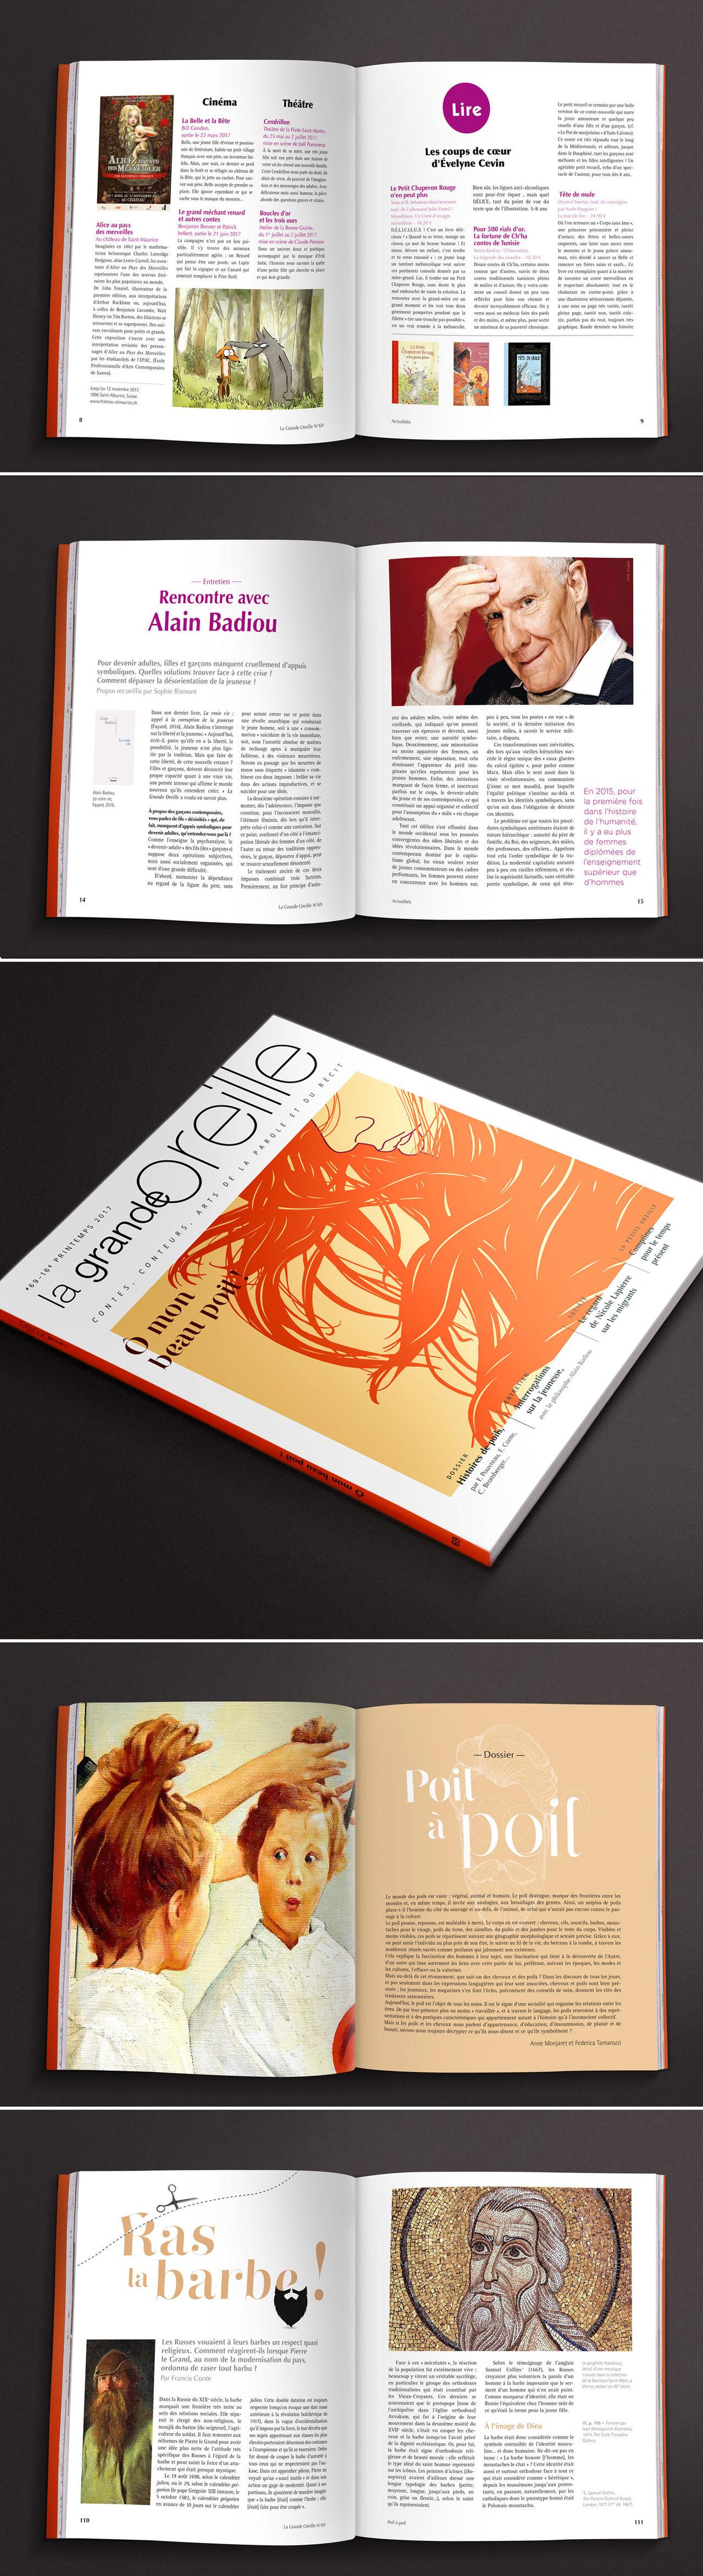 Charte graphique : magazine La Grande Oreille